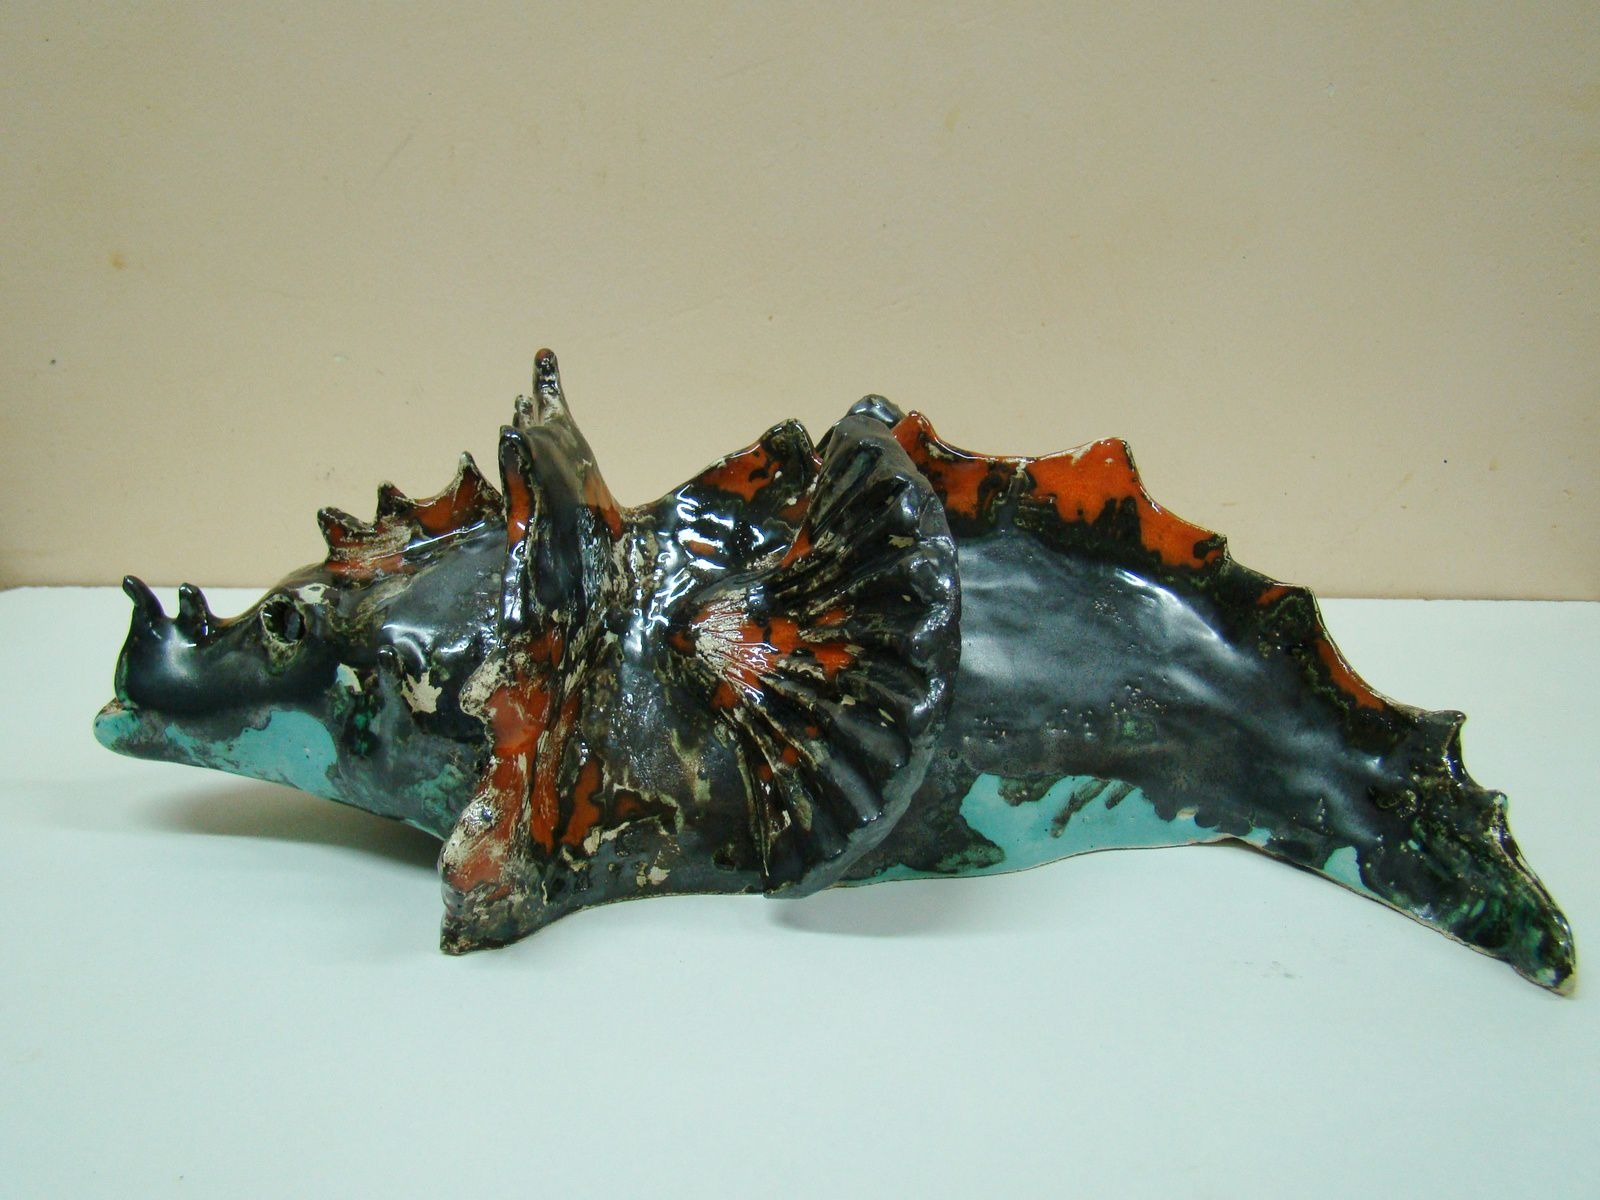 Poisson-dragon de Jean-Pierre